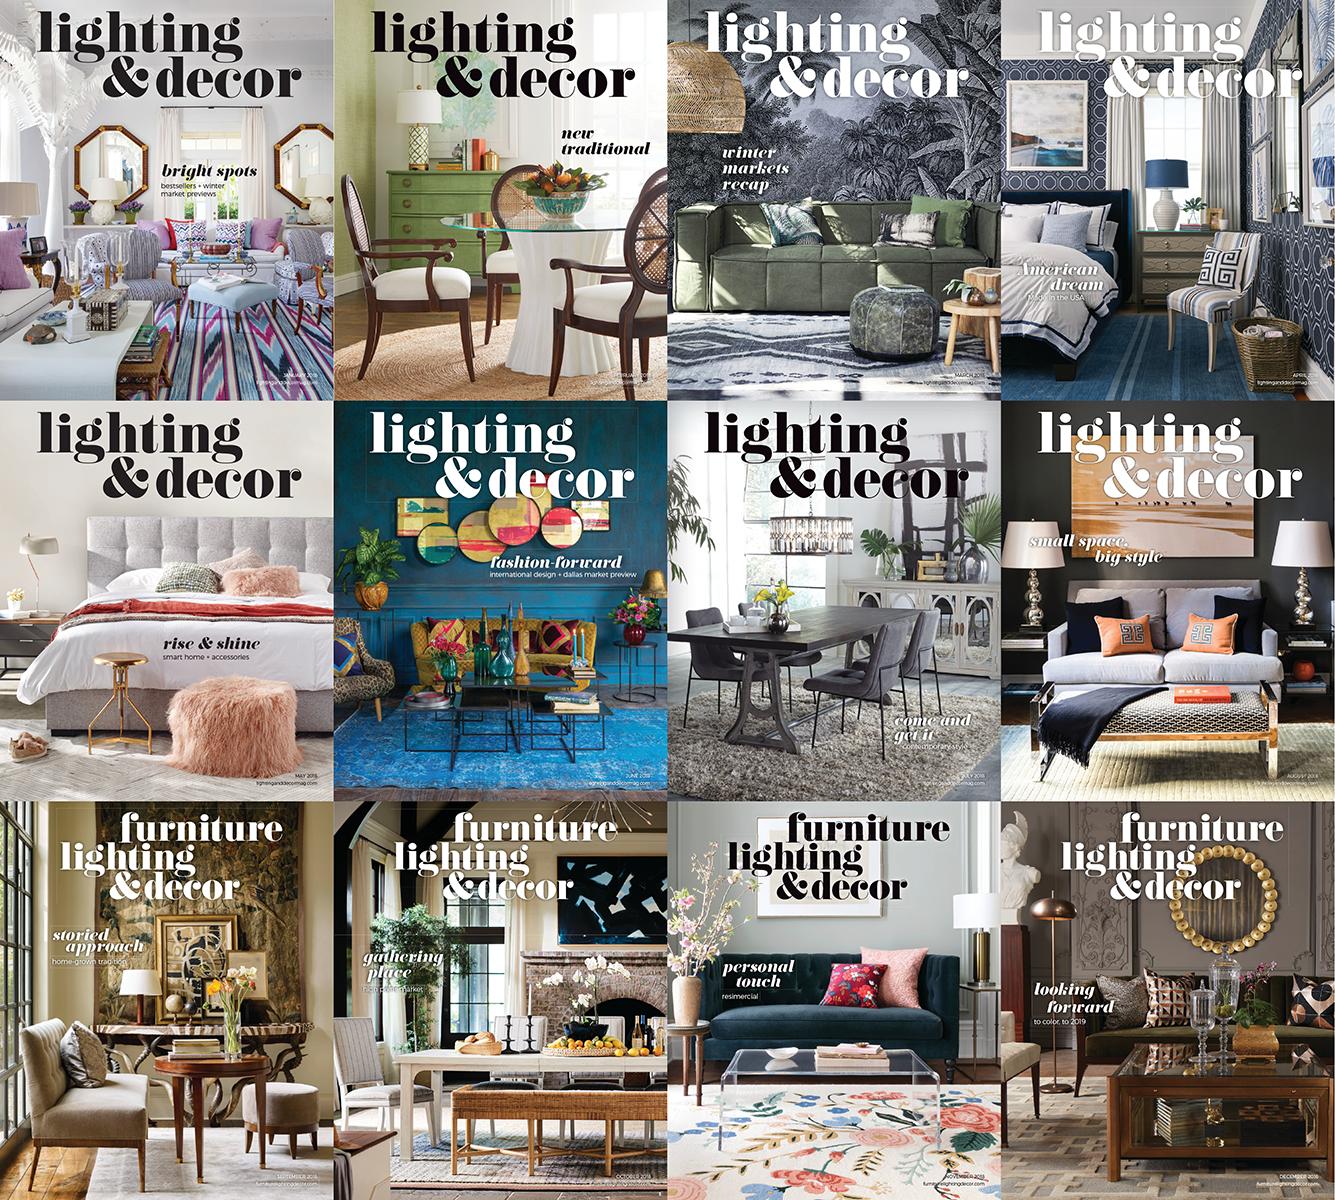 Lighting & Decor - 2018 Full Year Issues [PDF] from eBooks & Magazines